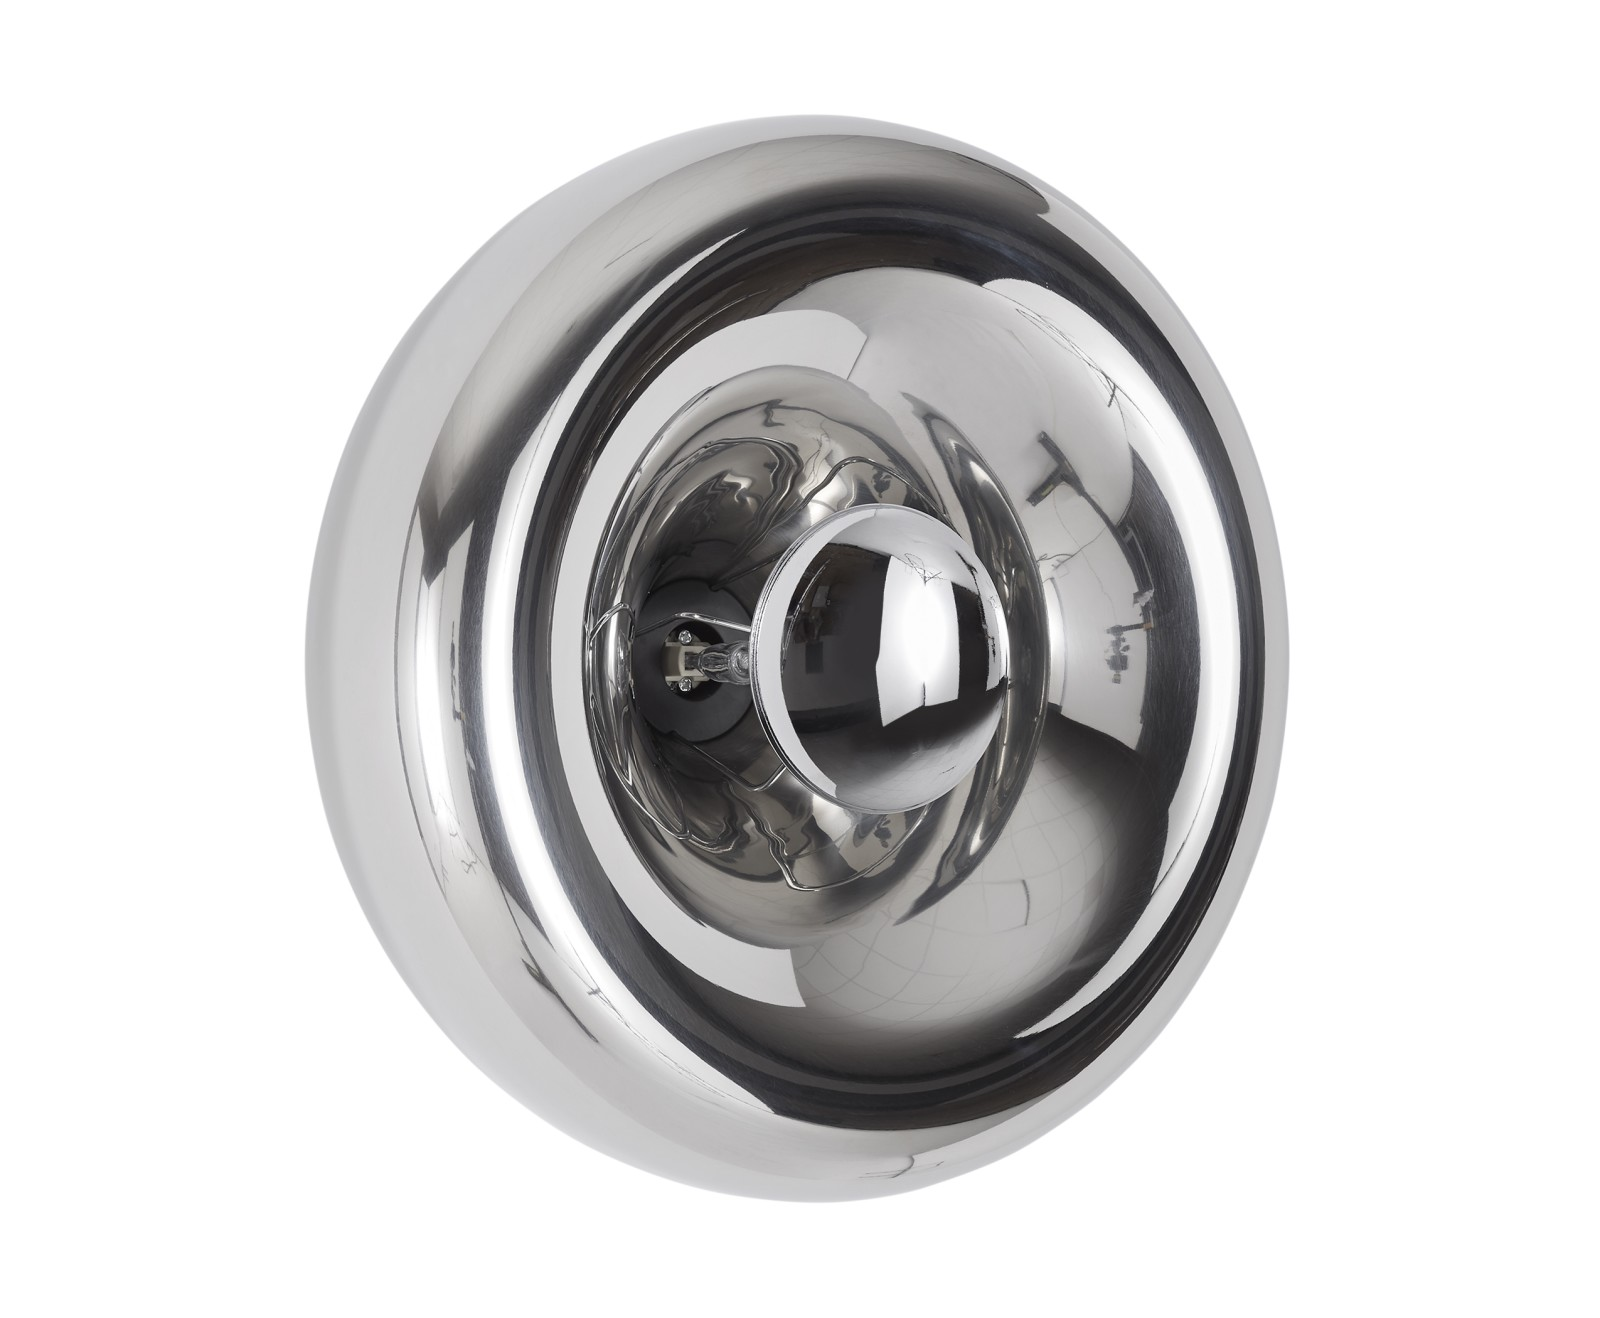 Void Surface Light Stainless Steel